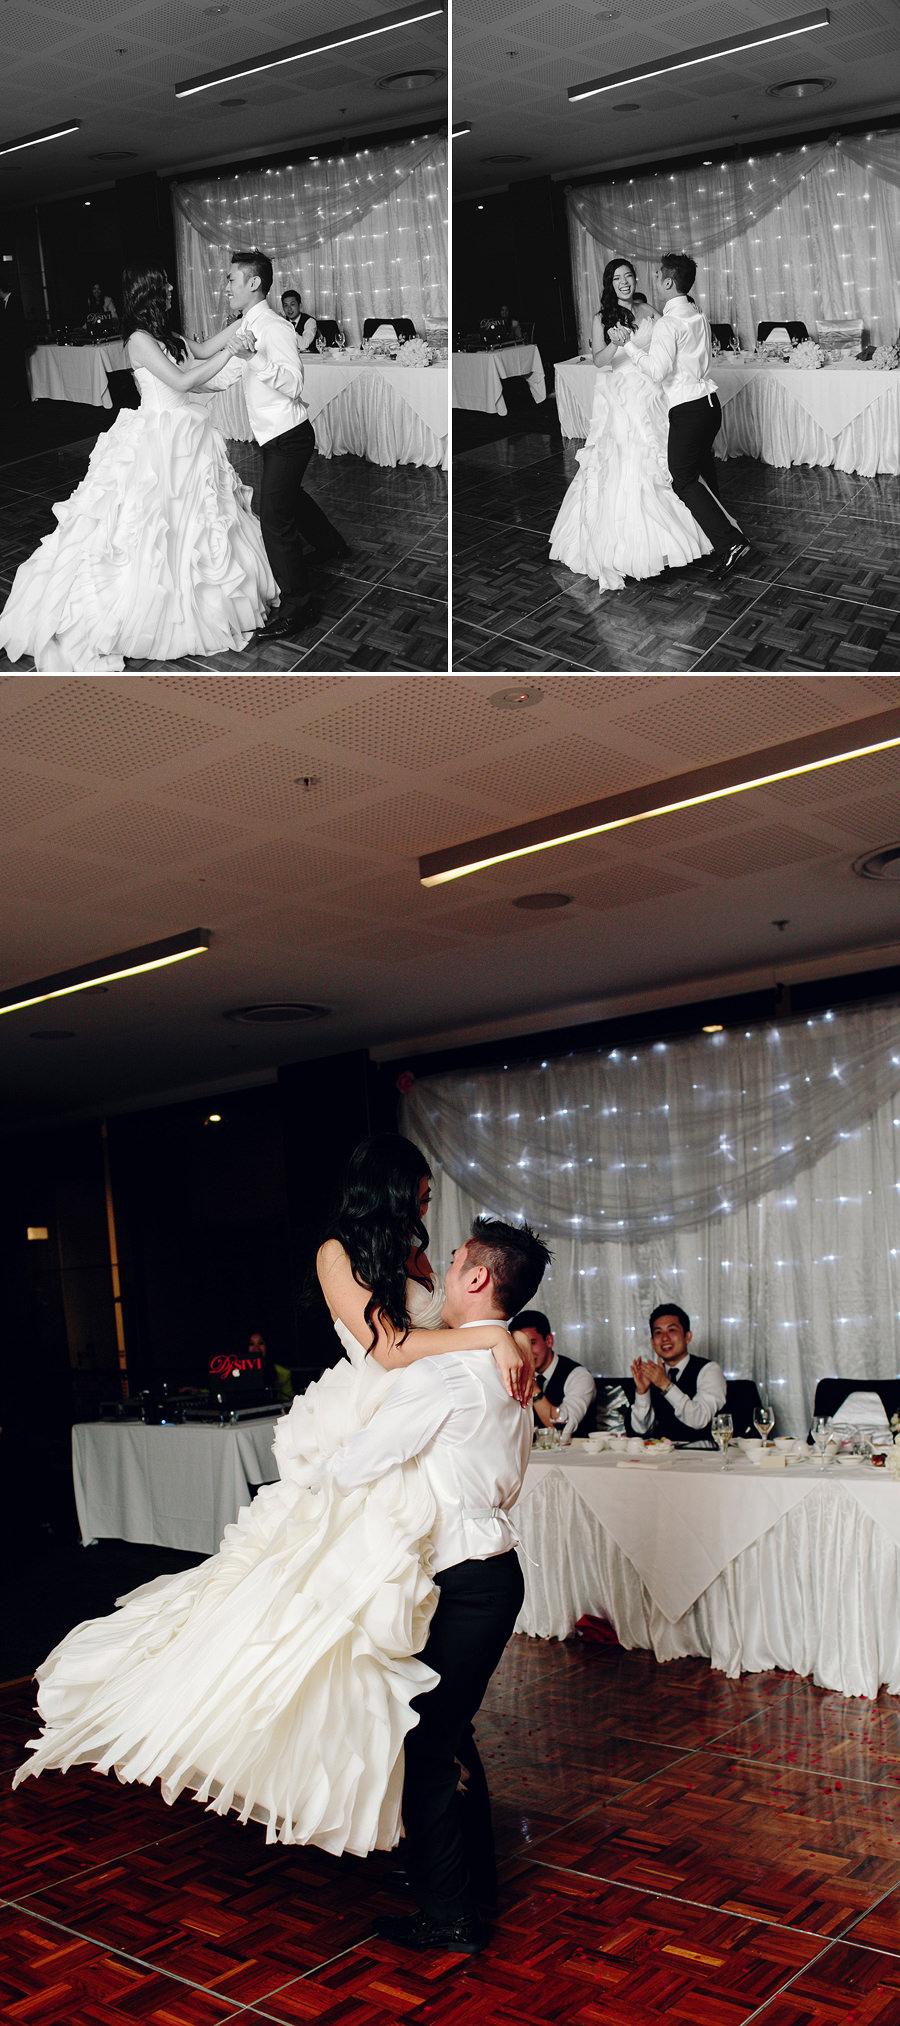 Parramatta Wedding Photographer: Bridal waltz